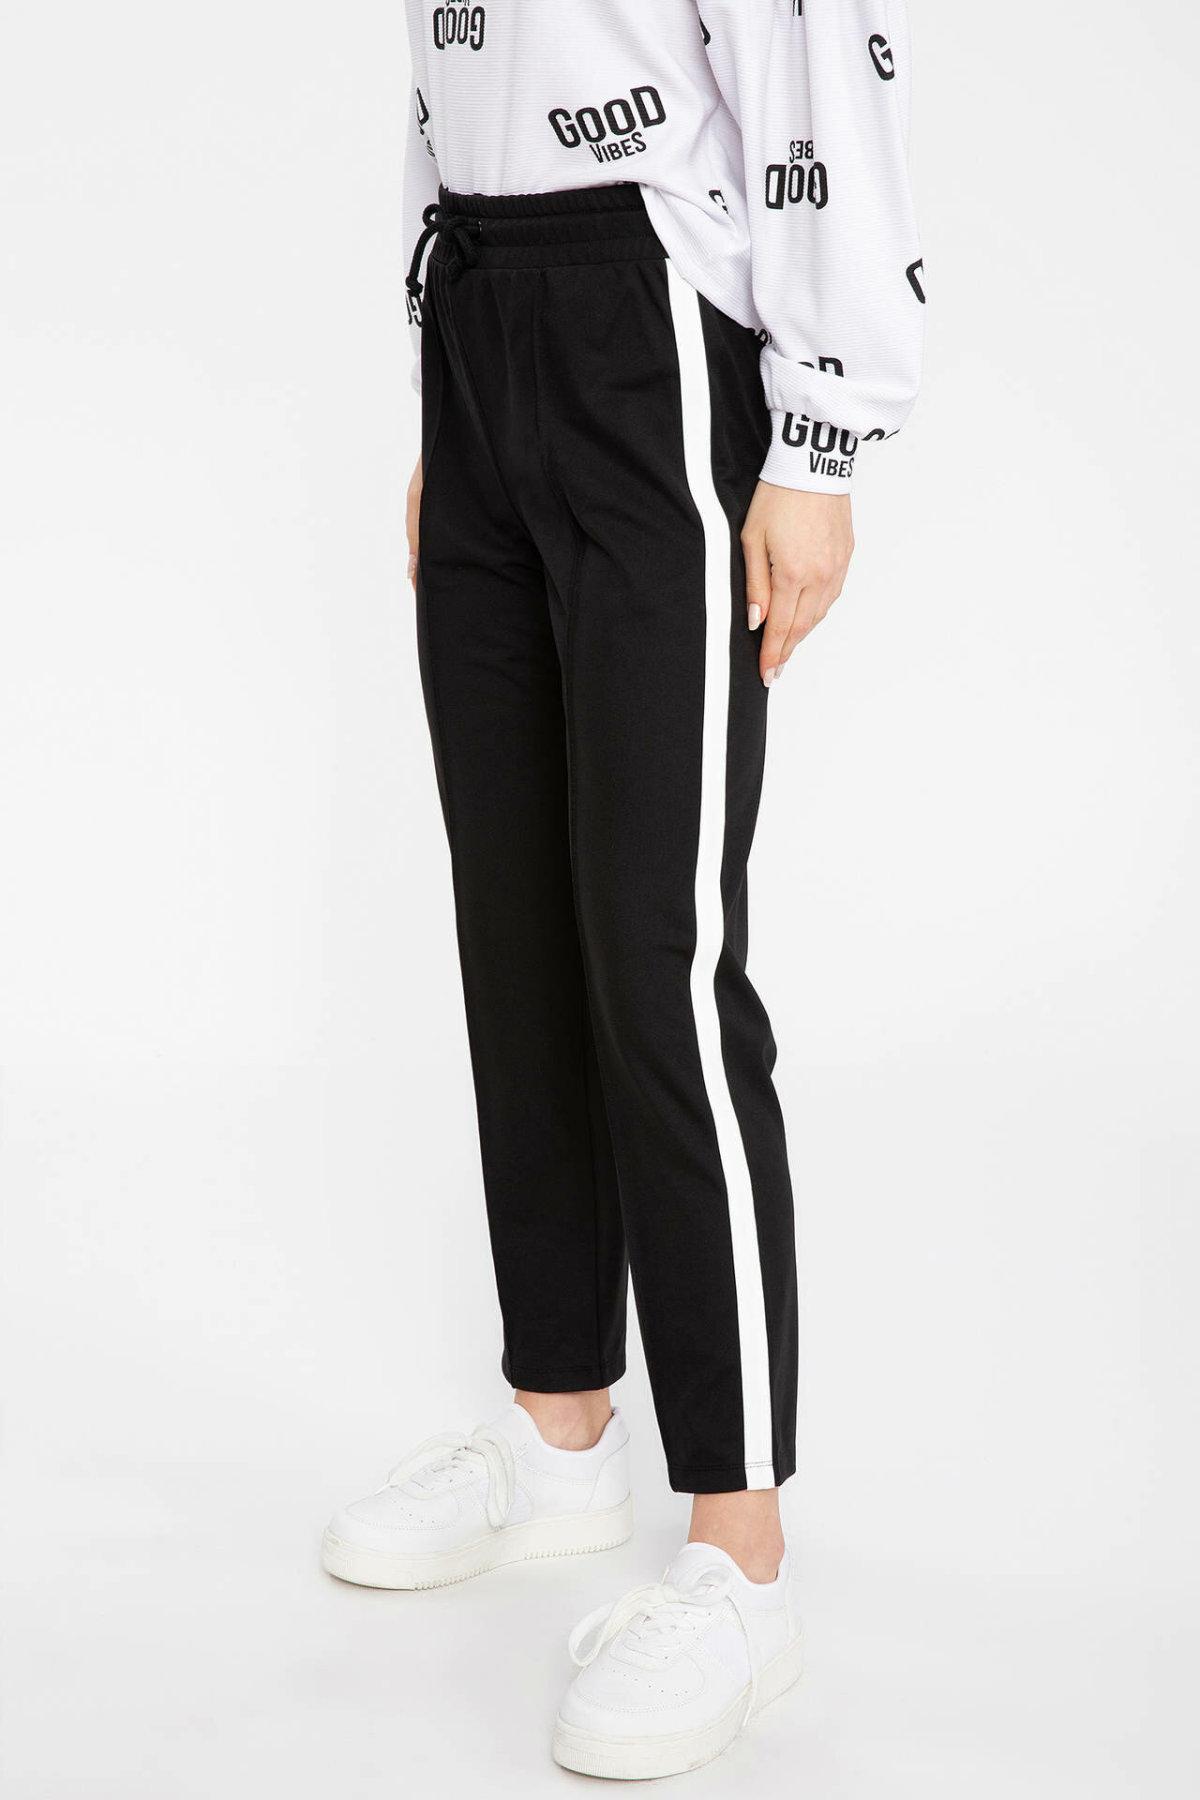 DeFacto Fashion Women Casual Jogger Pants Female Loose Drawstring Sweatpants Solid Sports Crop Trousers Lady- K8111AZ18CW